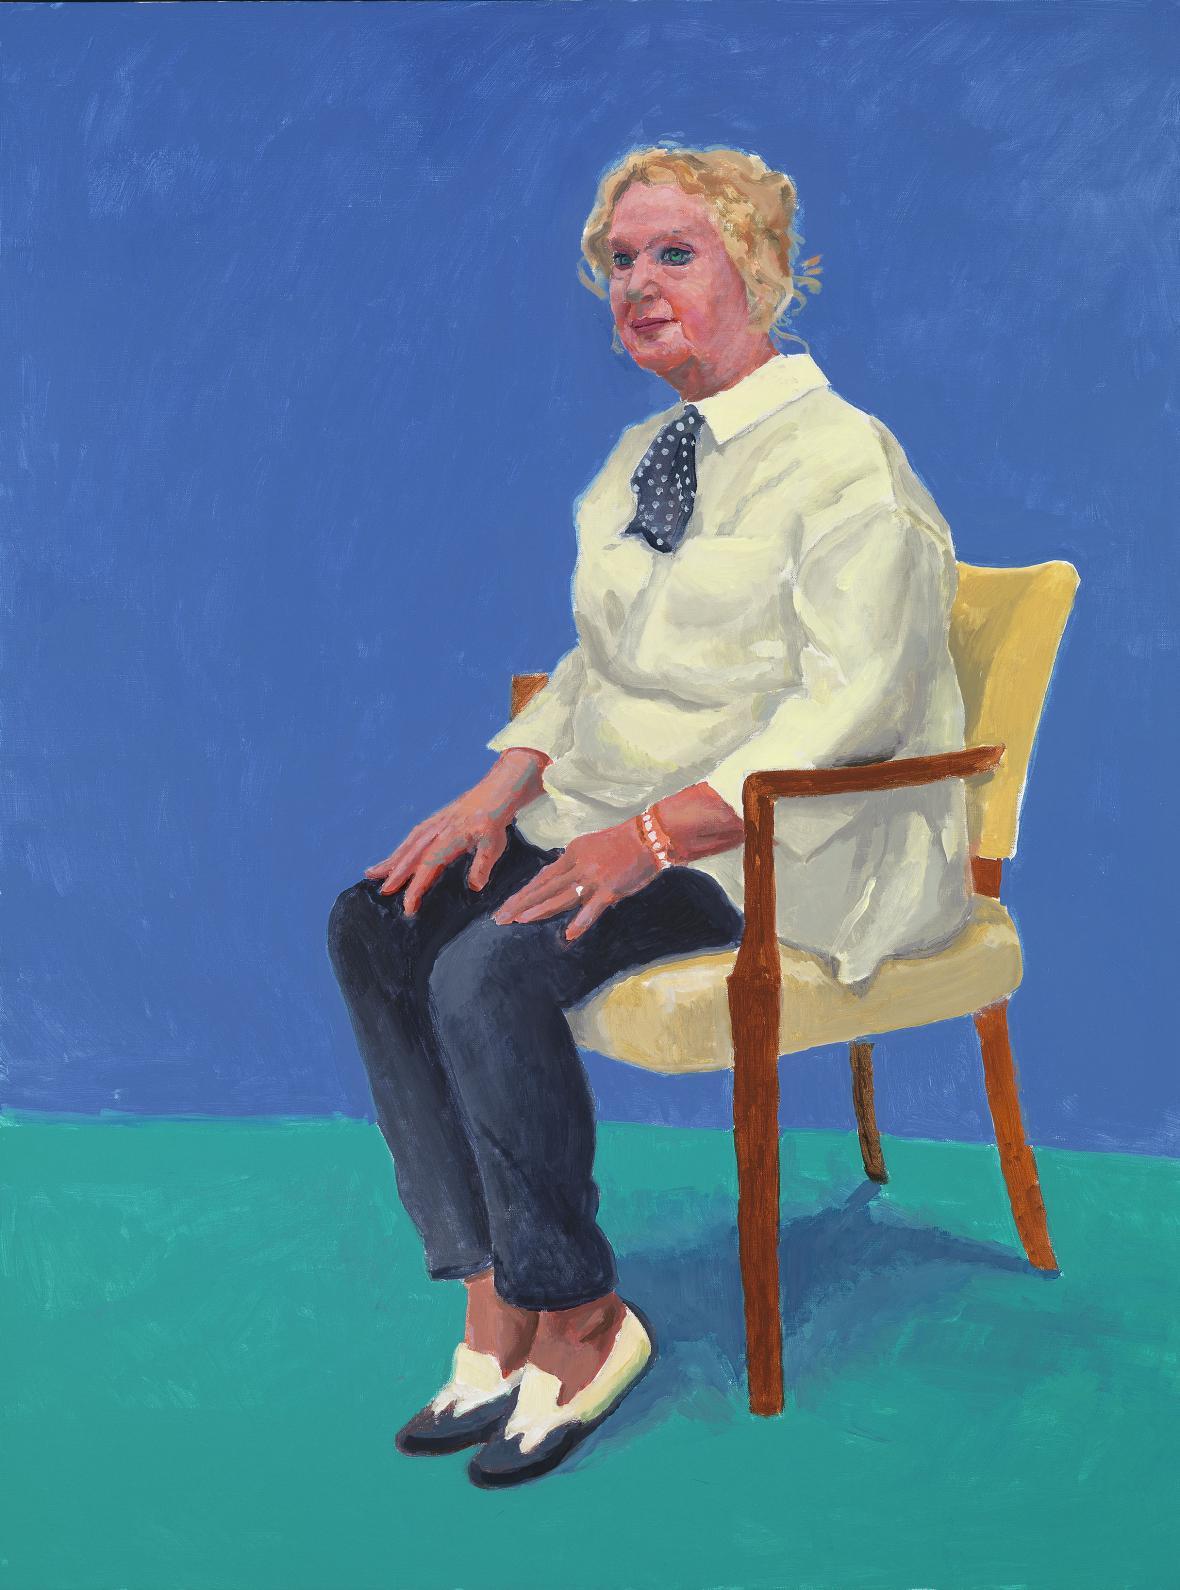 David Hockney / Celia Birtwell, 2015